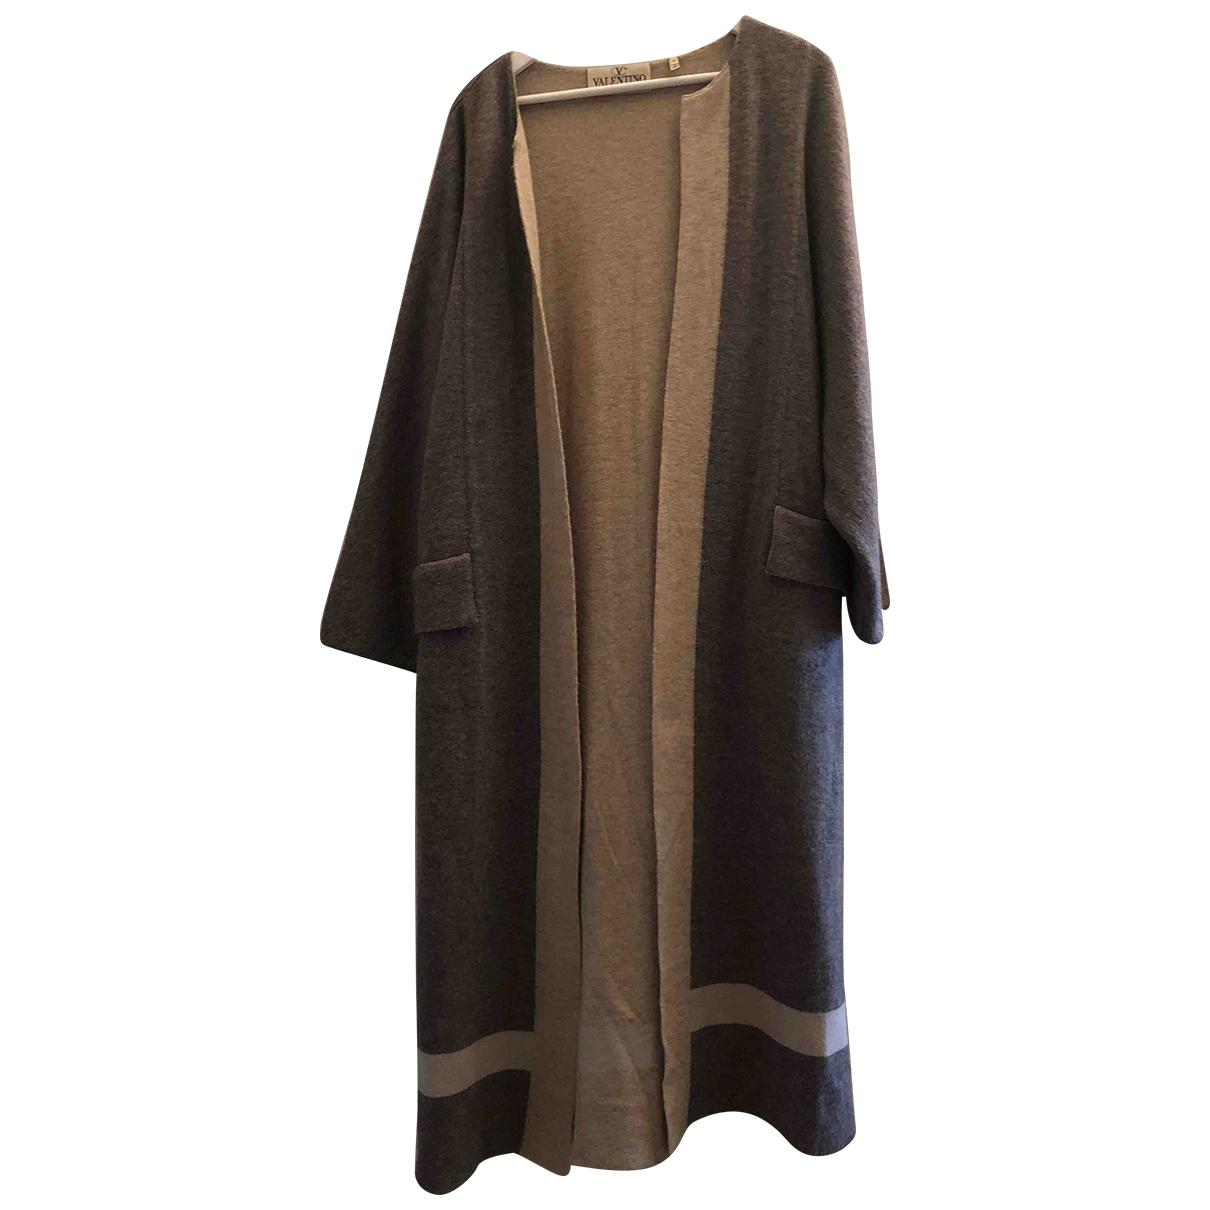 Valentino Garavani \N Grey Cashmere coat for Women M International